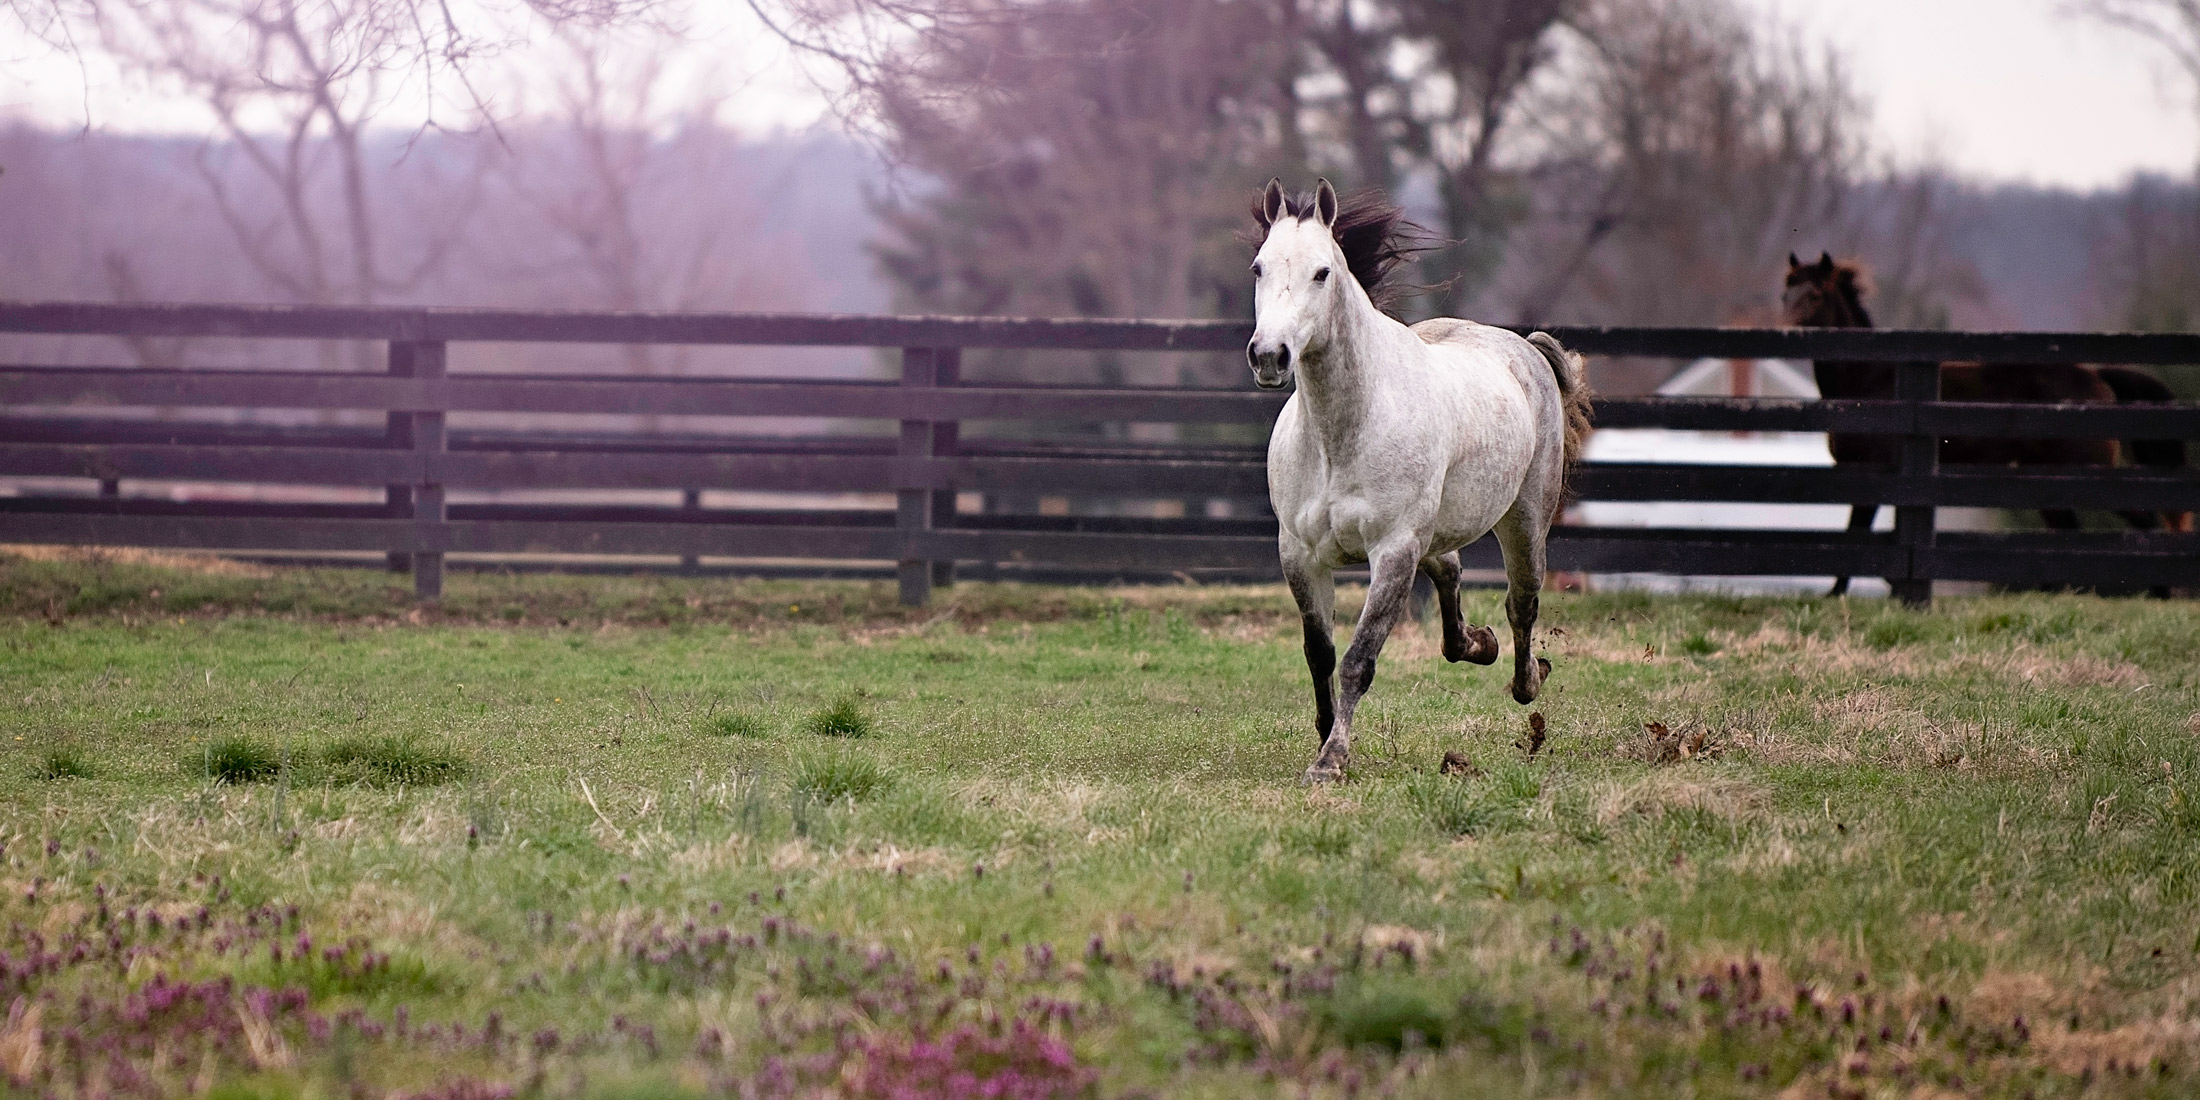 Willow-Horse-Running-Equine-Photography.jpg